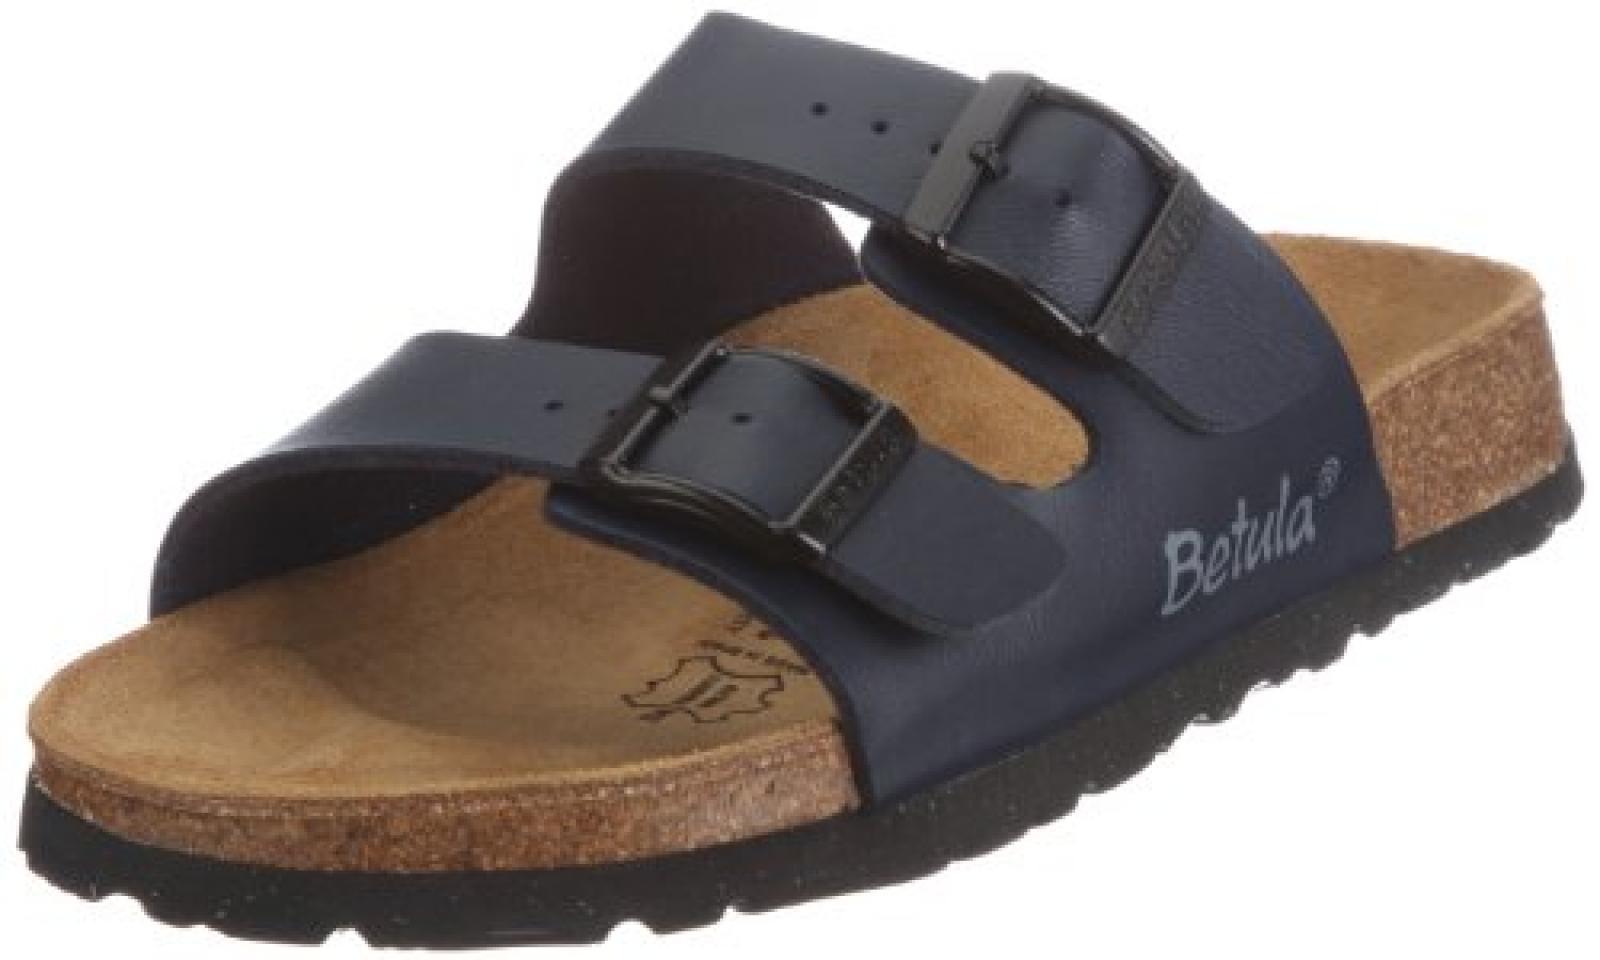 Betula Boogie 441673 Unisex - Erwachsene Clogs & Pantoletten